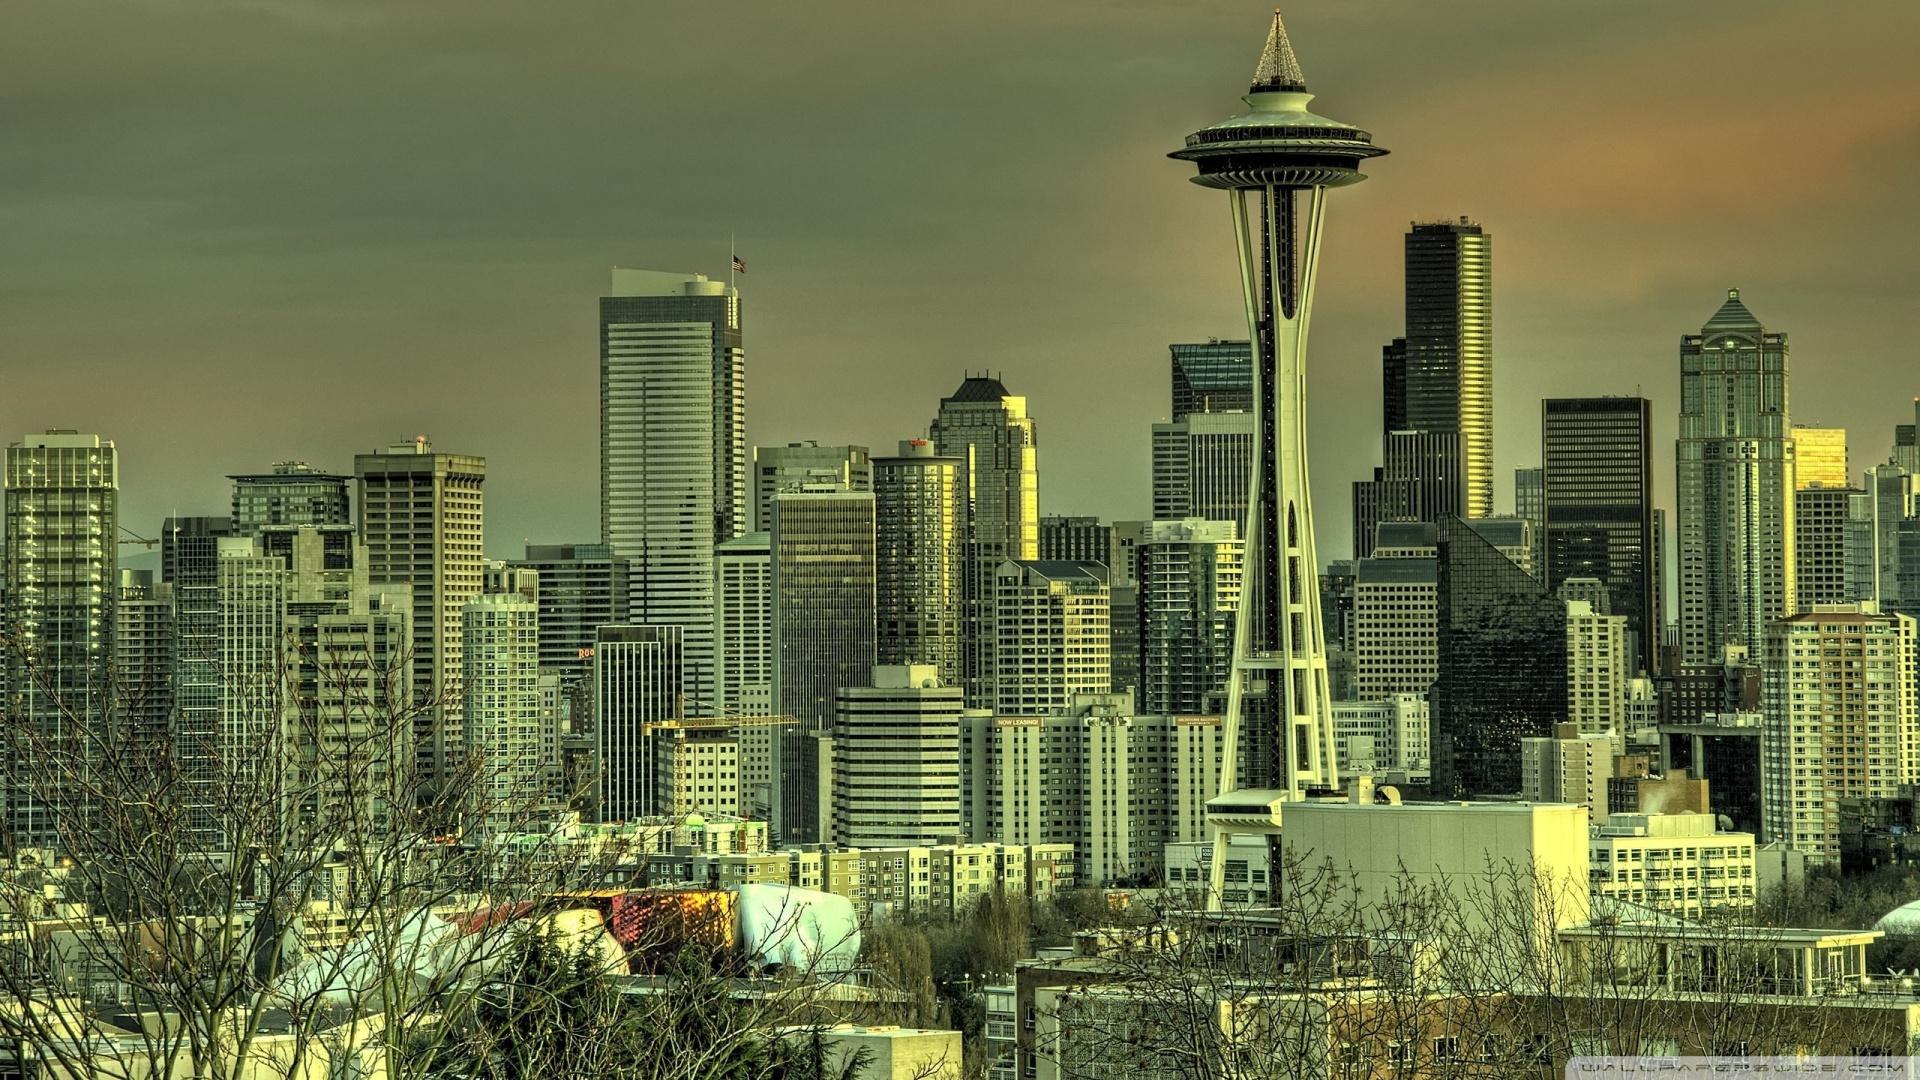 Seattle Tower Wallpaper 1920x1080 Seattle Tower 1920x1080